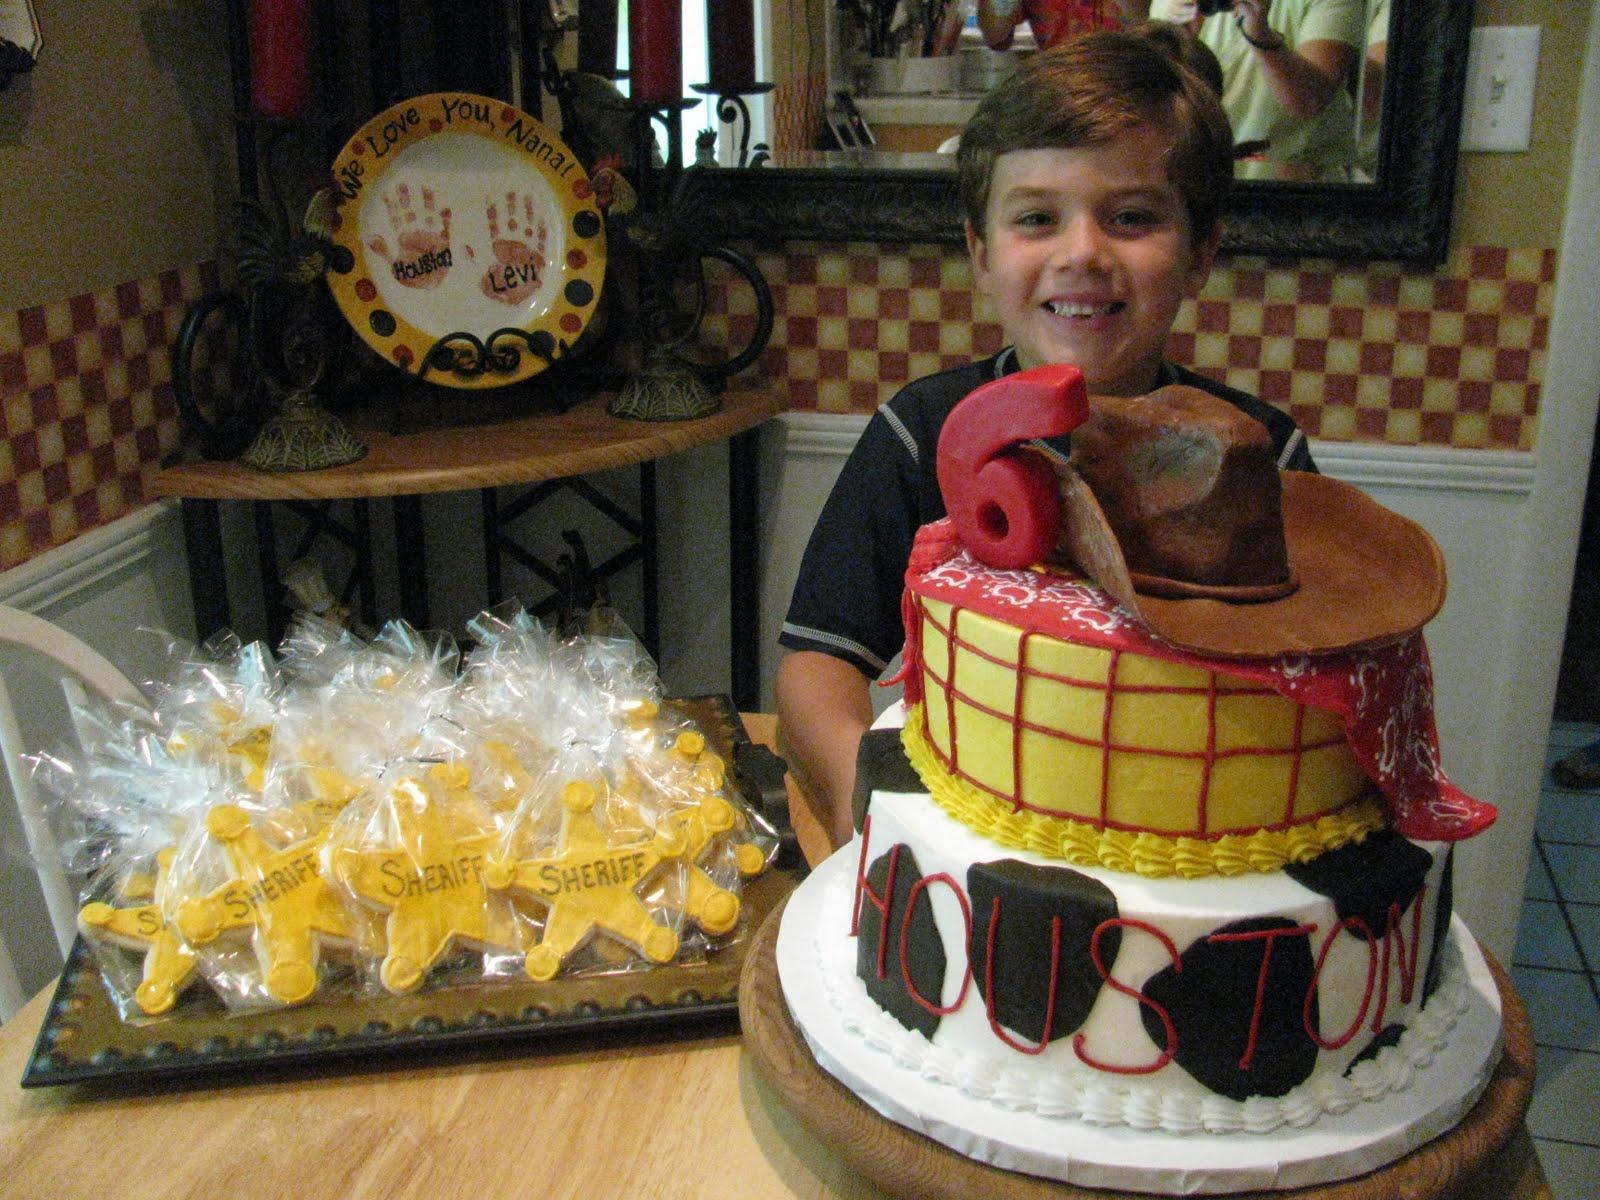 The Dessert Box Toy Story Inspired Cake